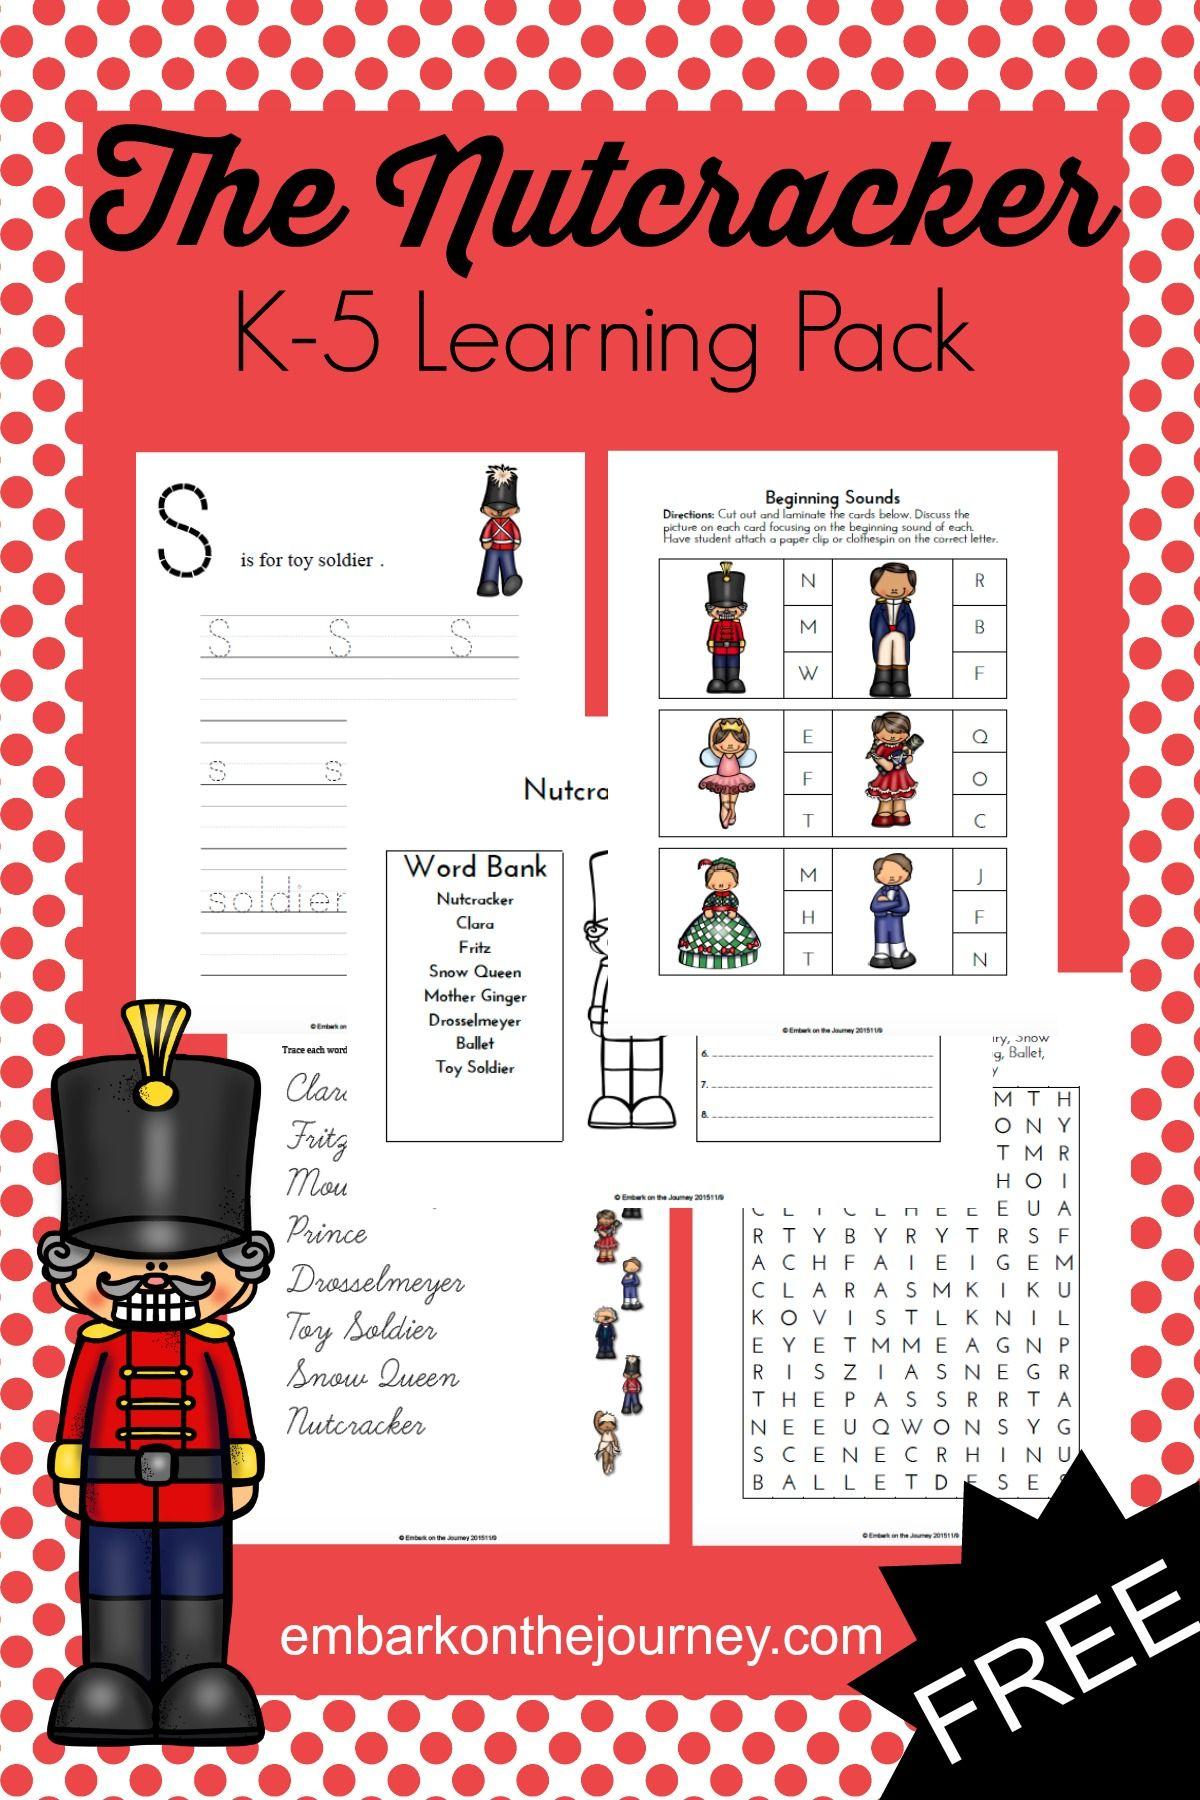 The Nutcracker Printable Learning Pack | Worksheets & Printables For | Nutcracker Worksheets Printable